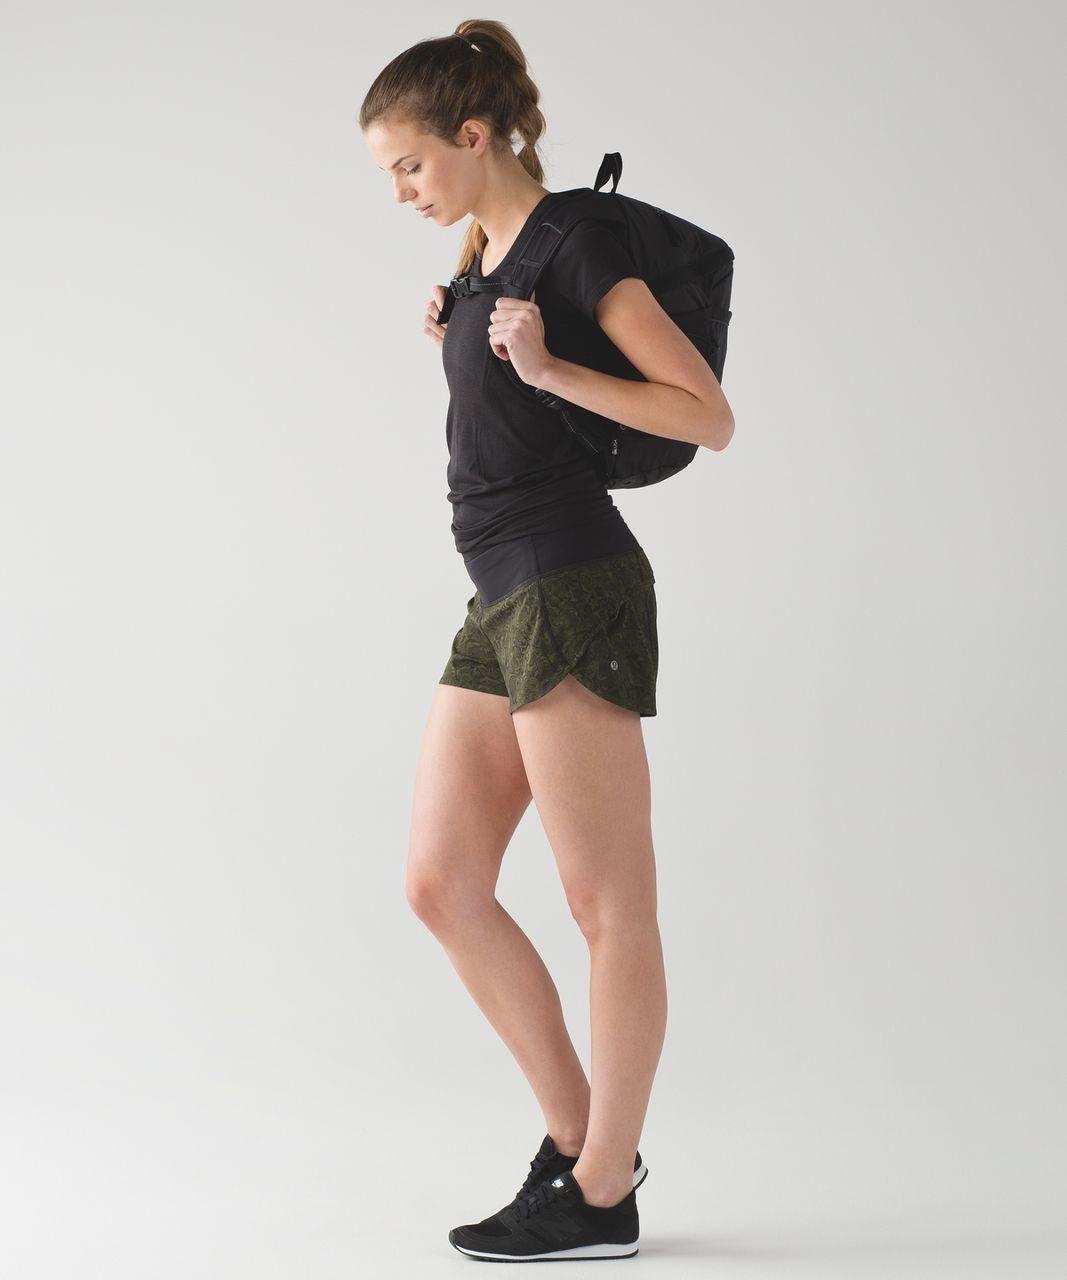 Lululemon Speed Short - Mini Pencil Lace Brave Olive Black / Black